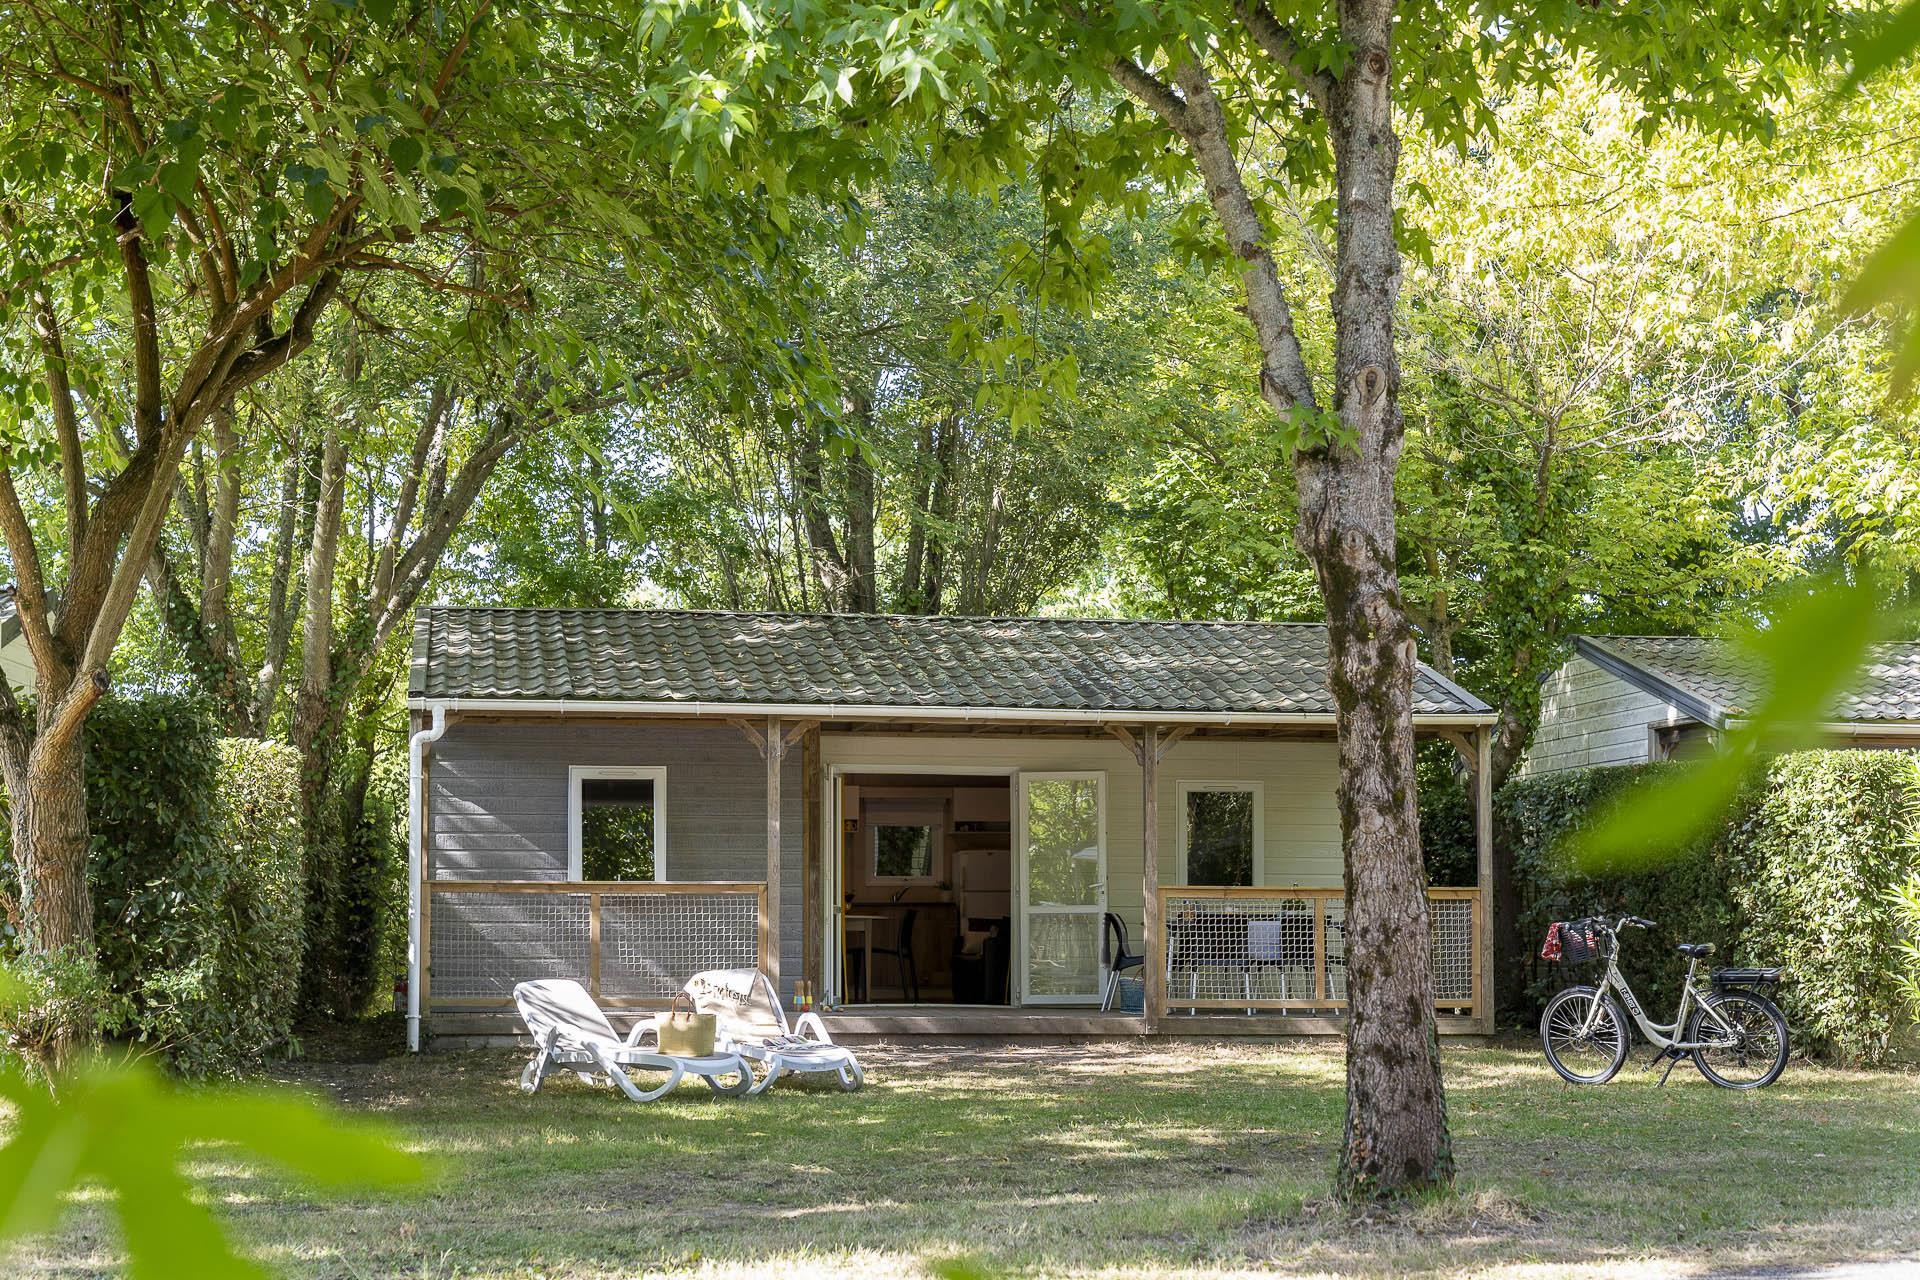 Location - Chalet Canopée 3 Chambres *** - Camping Sandaya Séquoia Parc